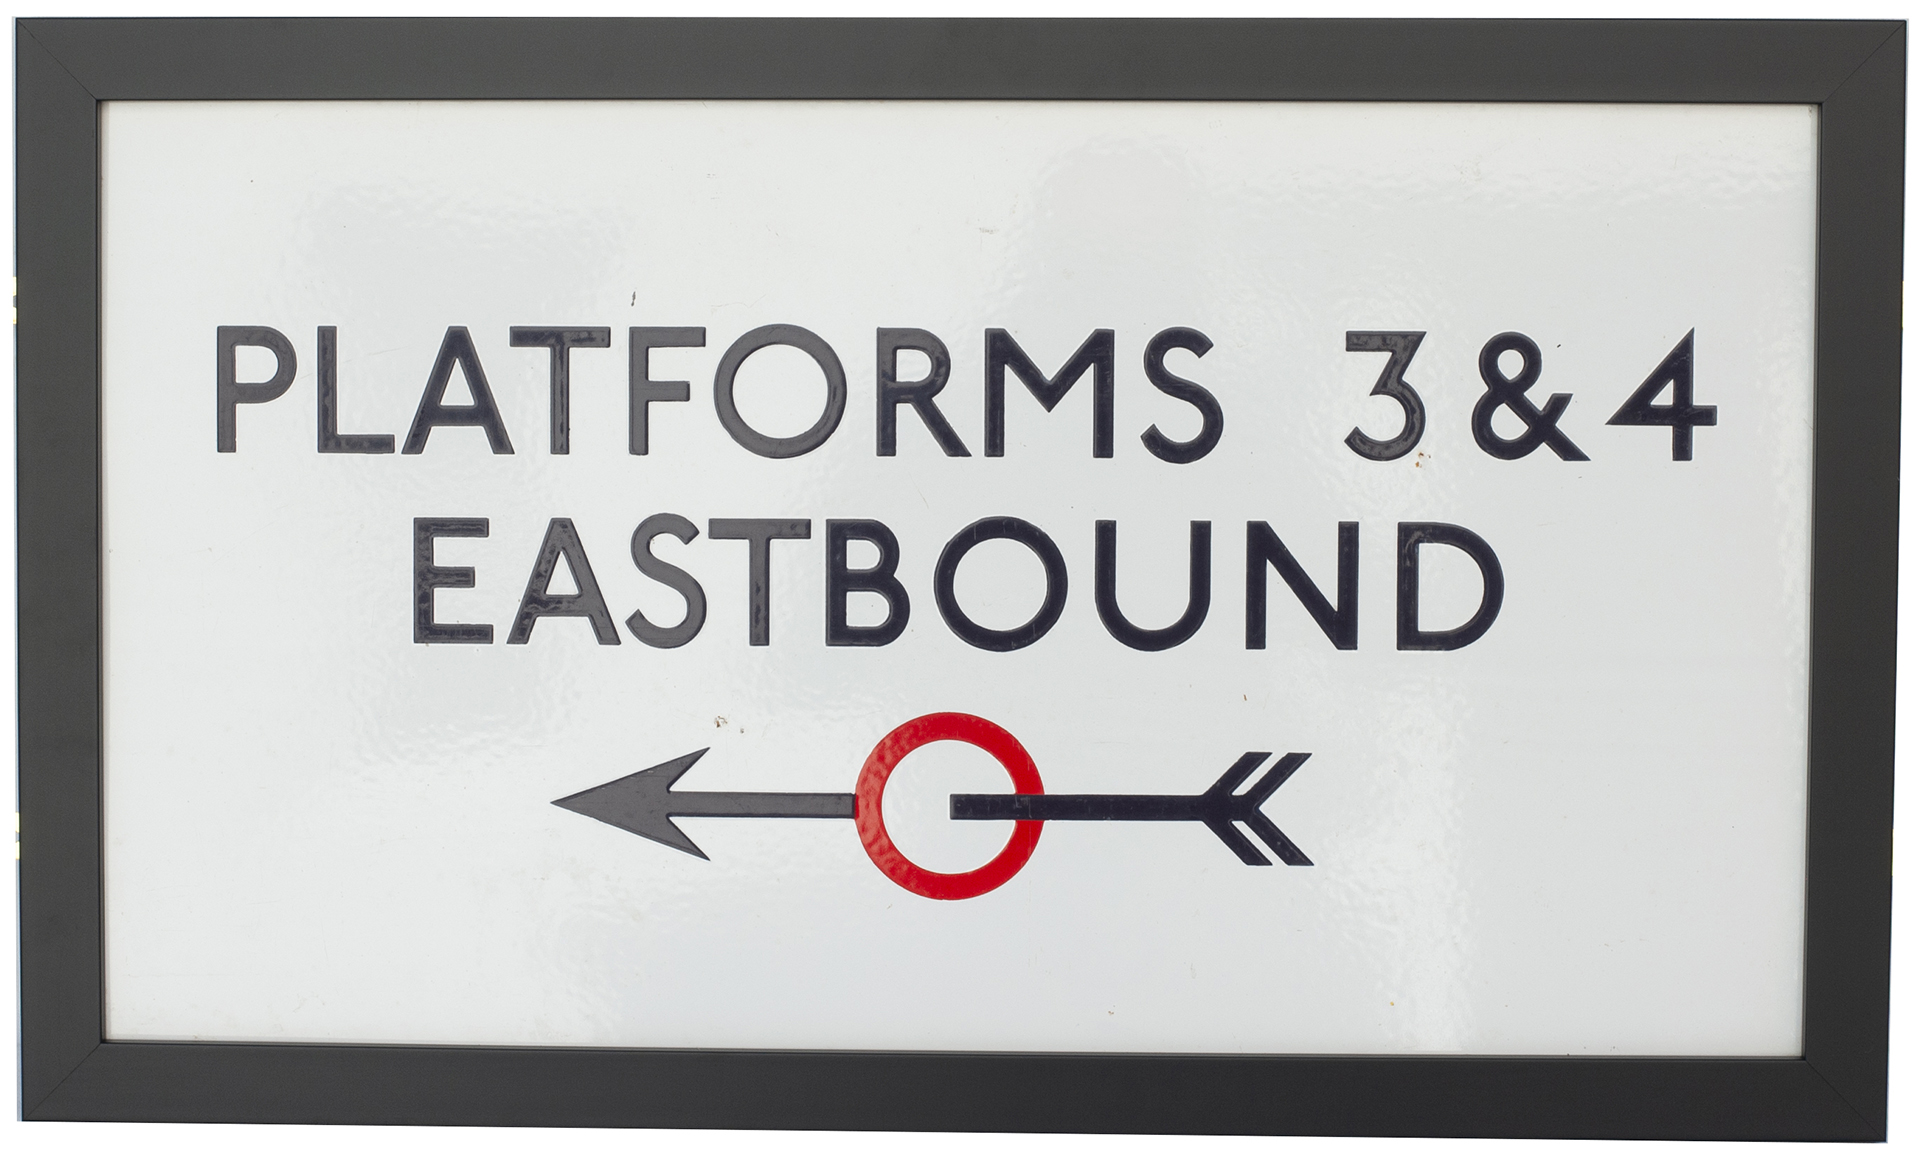 London Transport Underground enamel sign PLATFORMS 3 & 4 EASTBOUND with left facing arrow. In